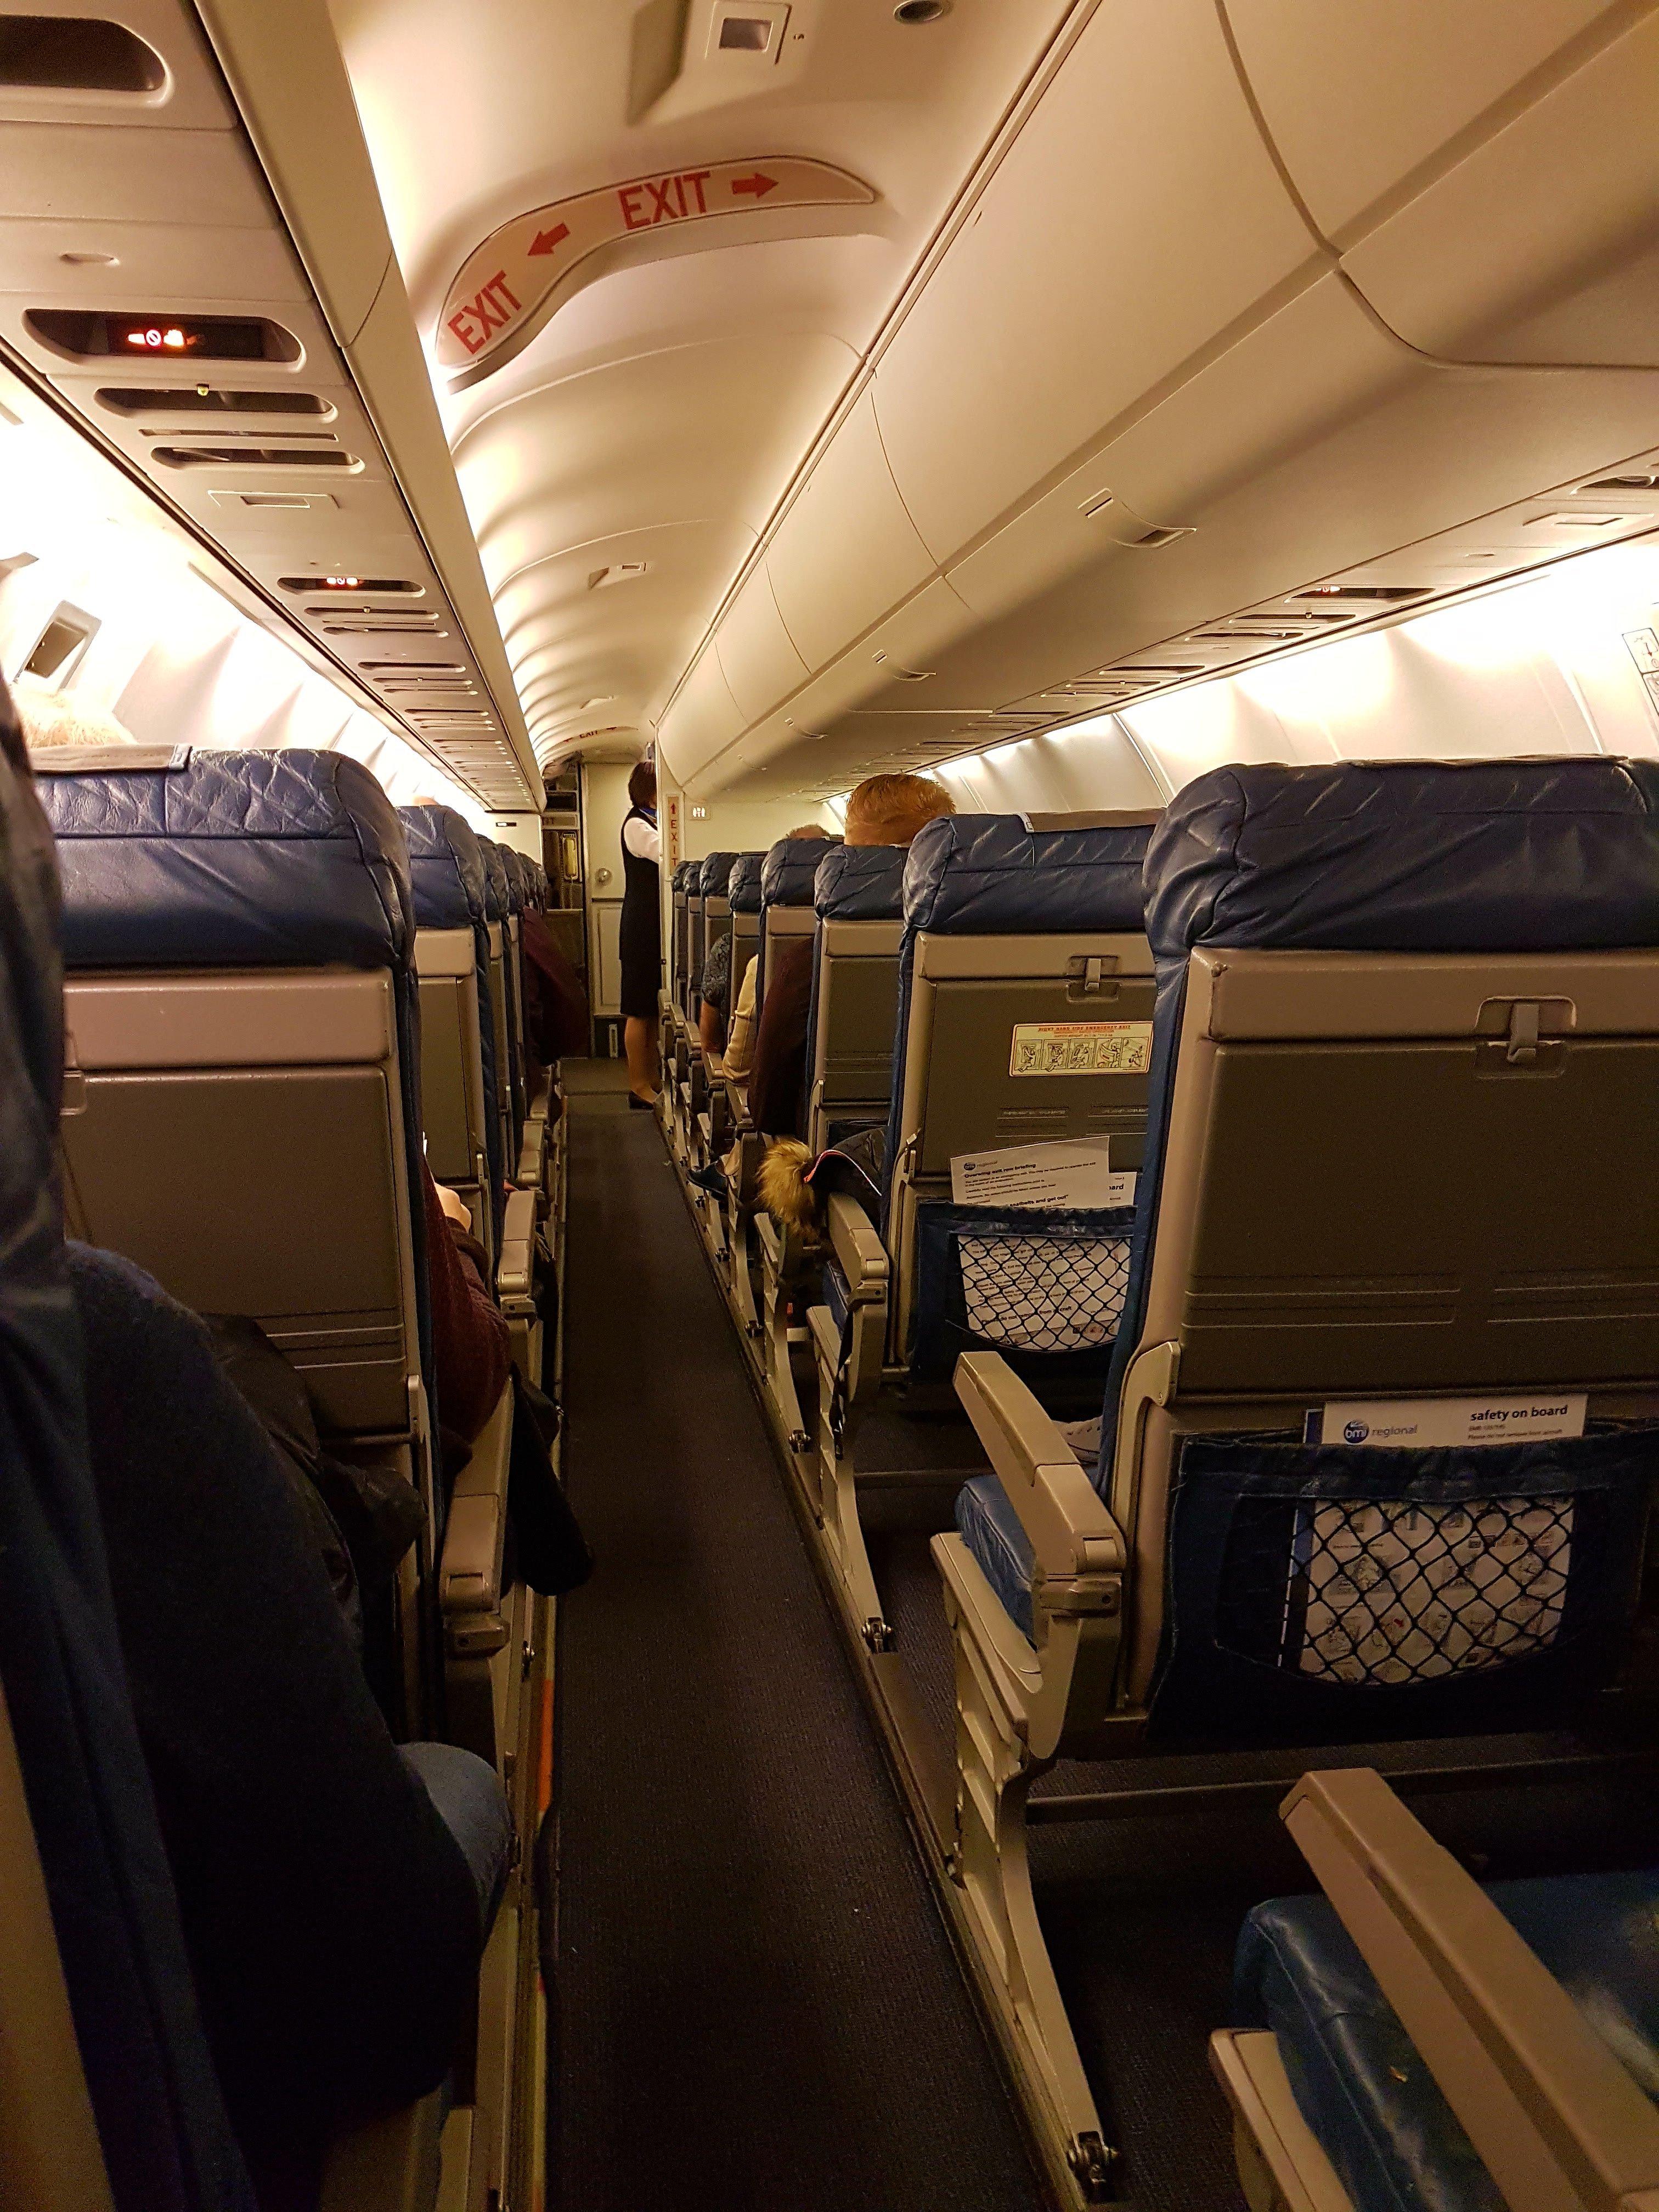 Interior of the Embraer jet aircraft BMI Regional